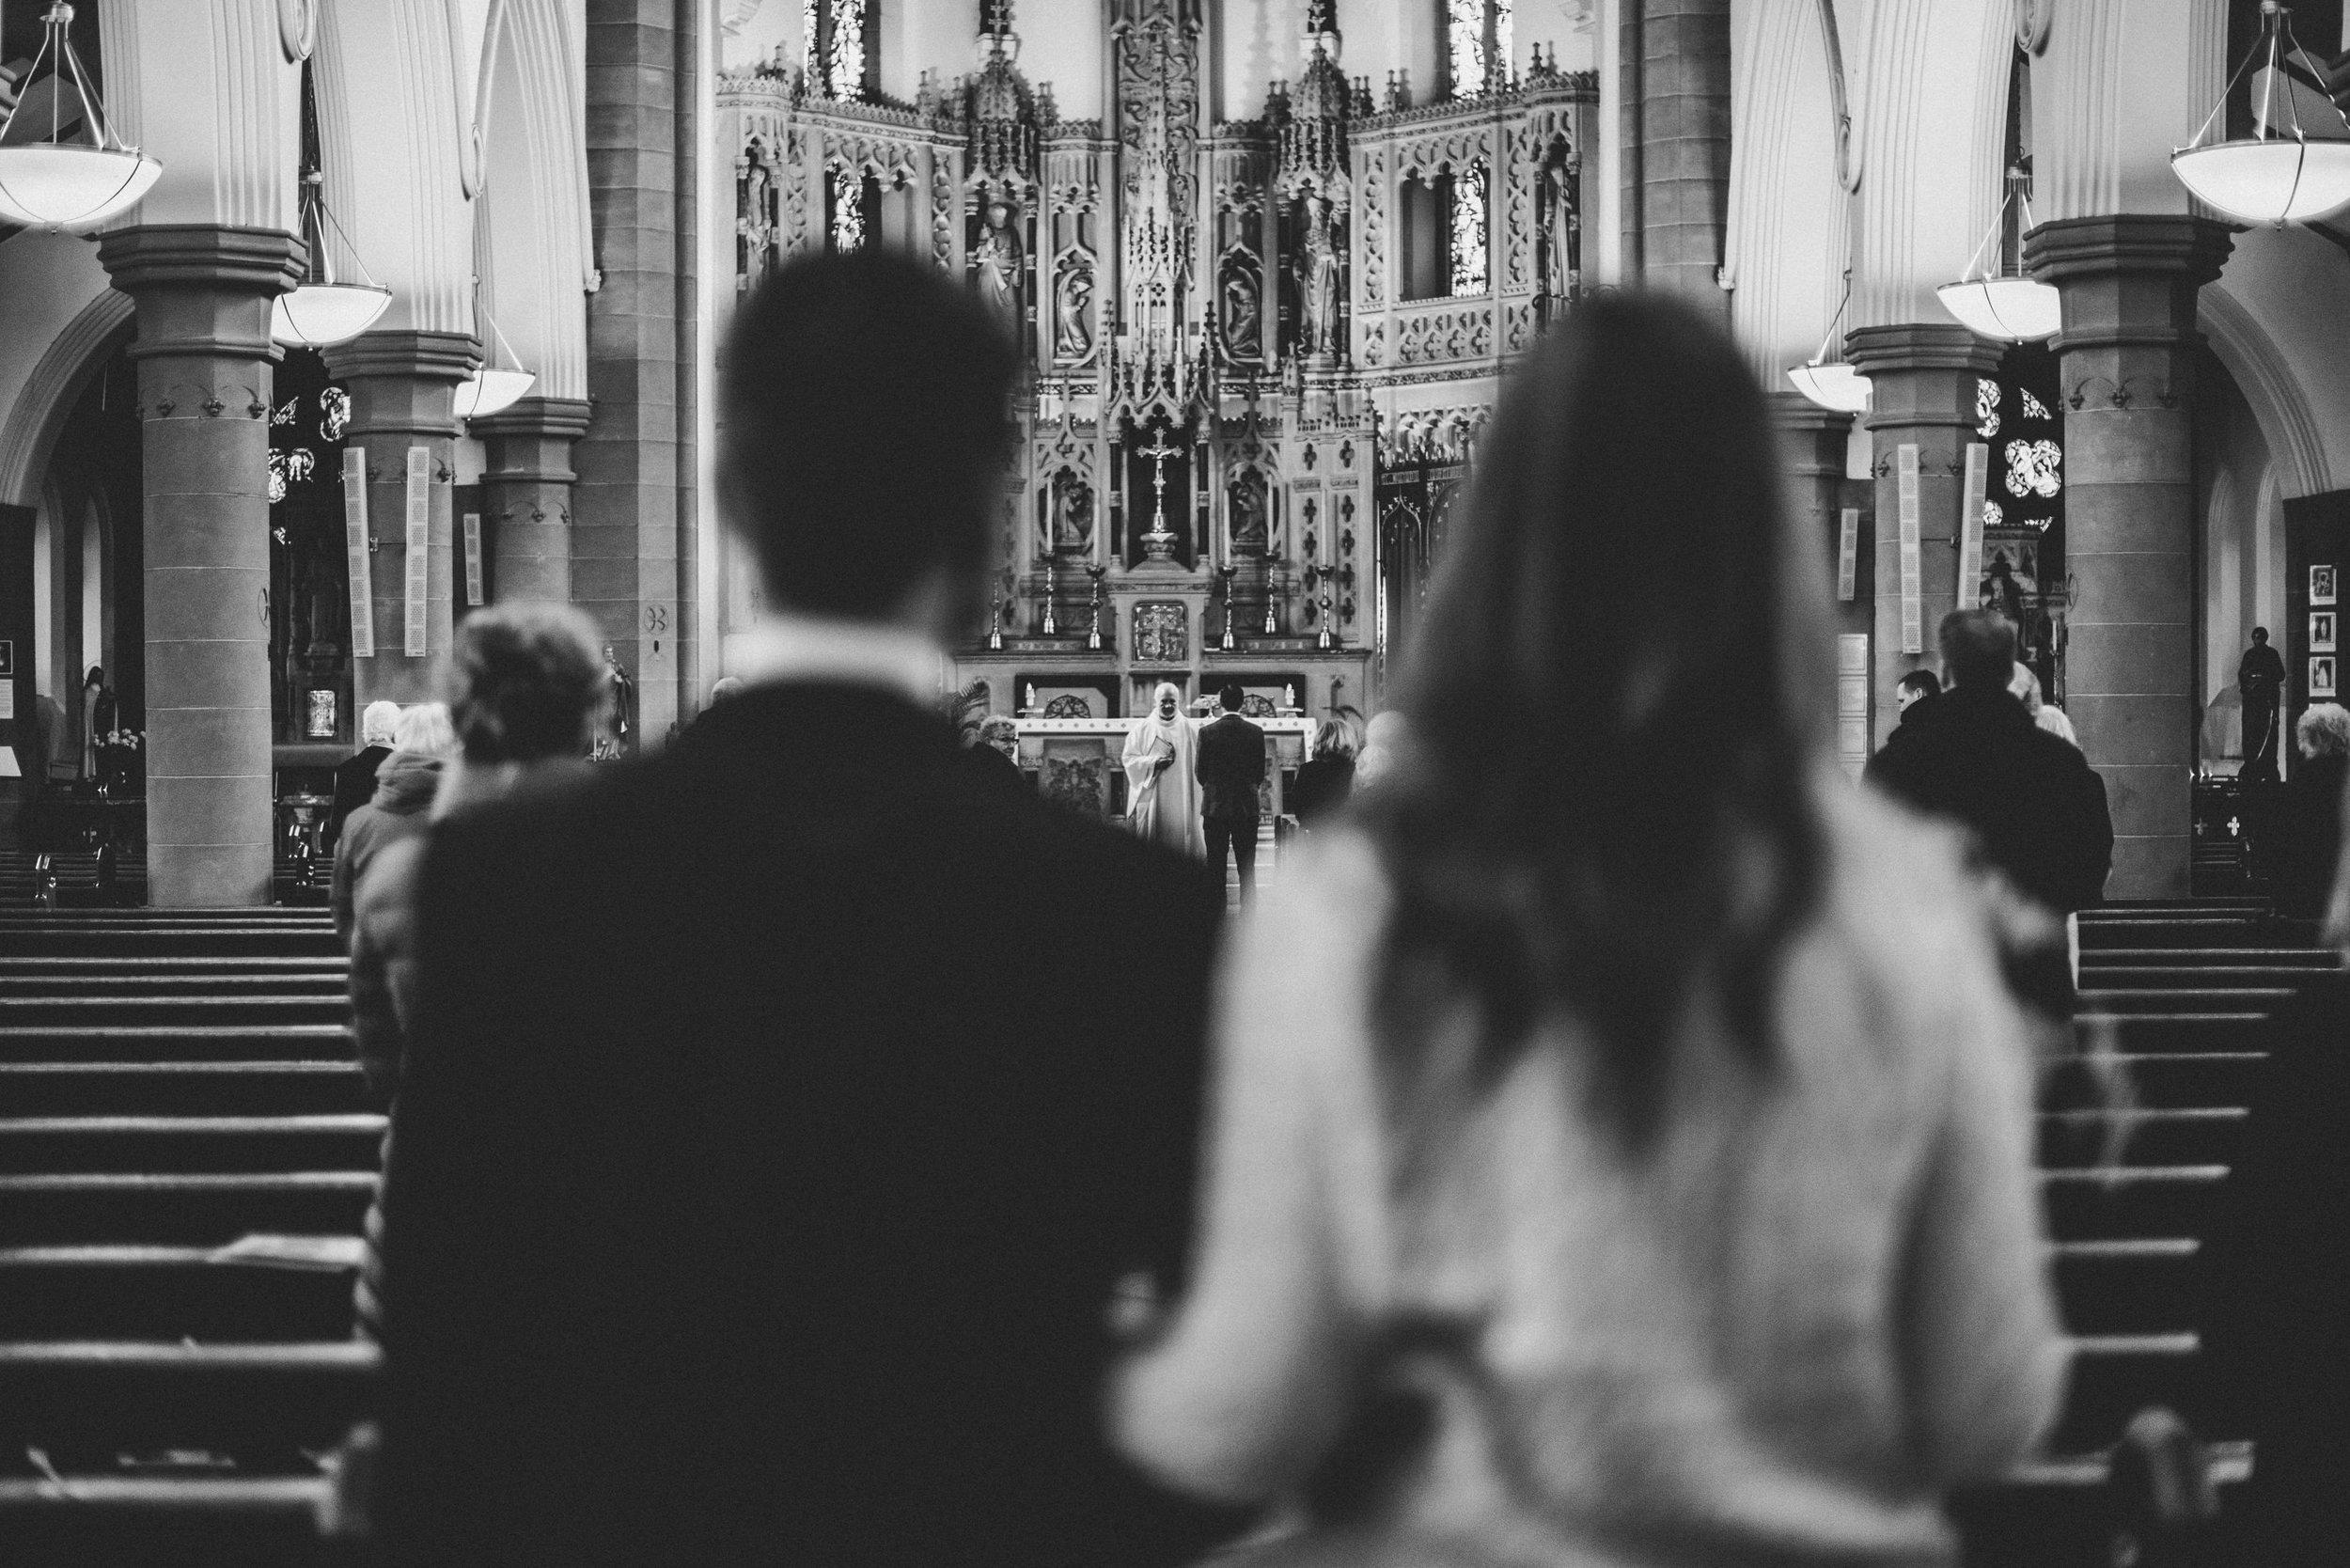 0137-LISA-DEVINE-PHOTOGRAPHY-ALTERNATIVE-WEDDING-PHOTOGRAPHY-SCOTLAND-DESTINATION-WEDDINGS-GLASGOW-WEDDINGS-COOL-WEDDINGS-STYLISH-WEDDINGS.JPG